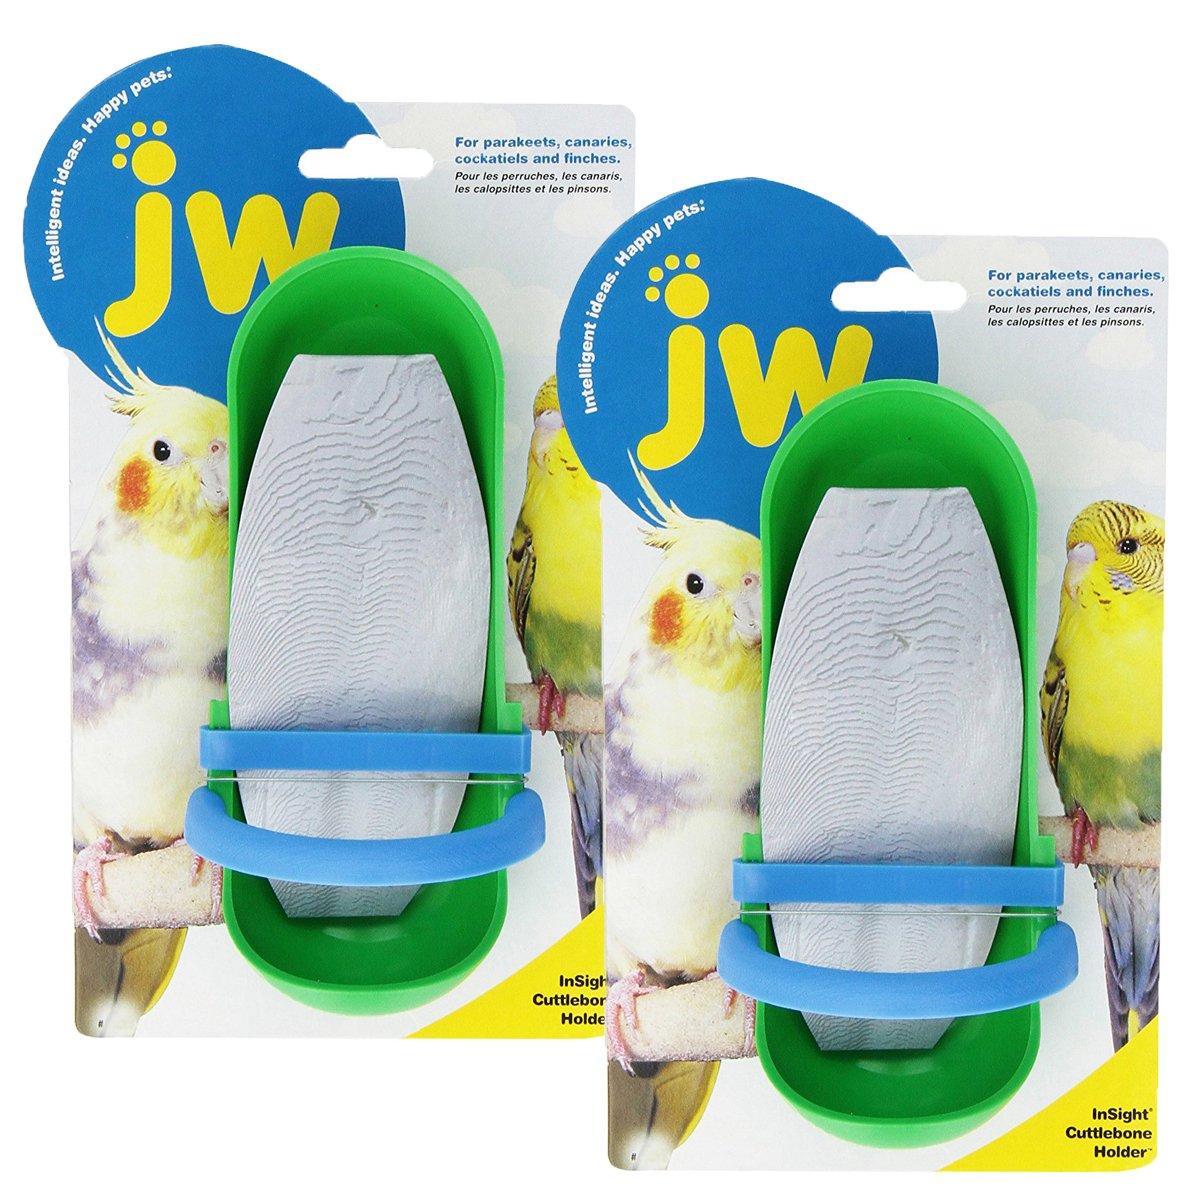 JW Pet Company Insight Cuttlebone Holder, Colors Vary 31313